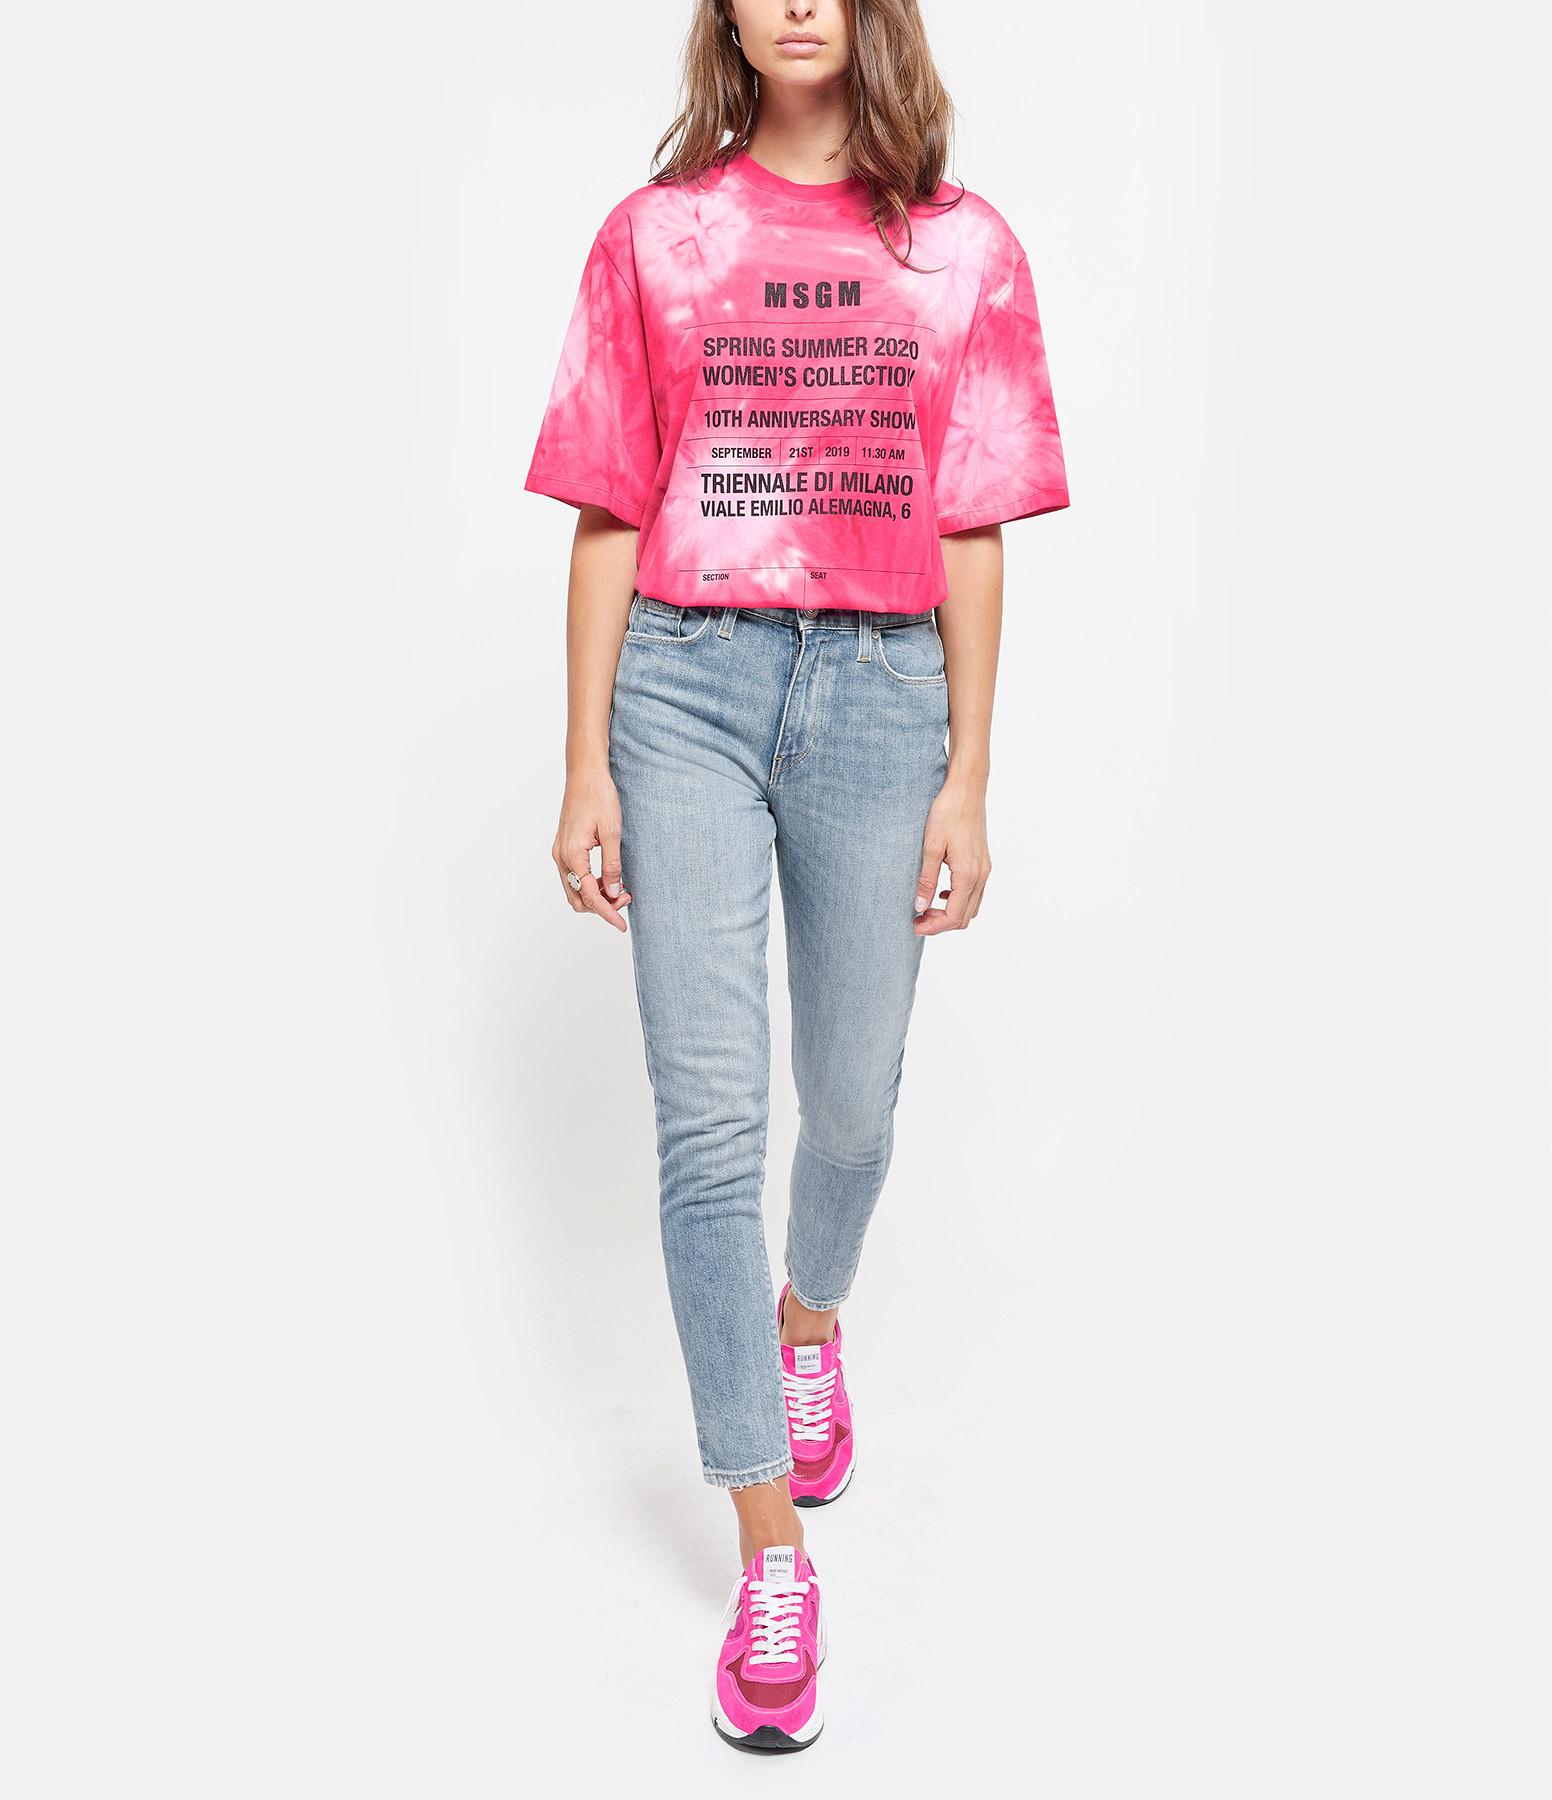 MSGM - Tee-shirt Coton Rose